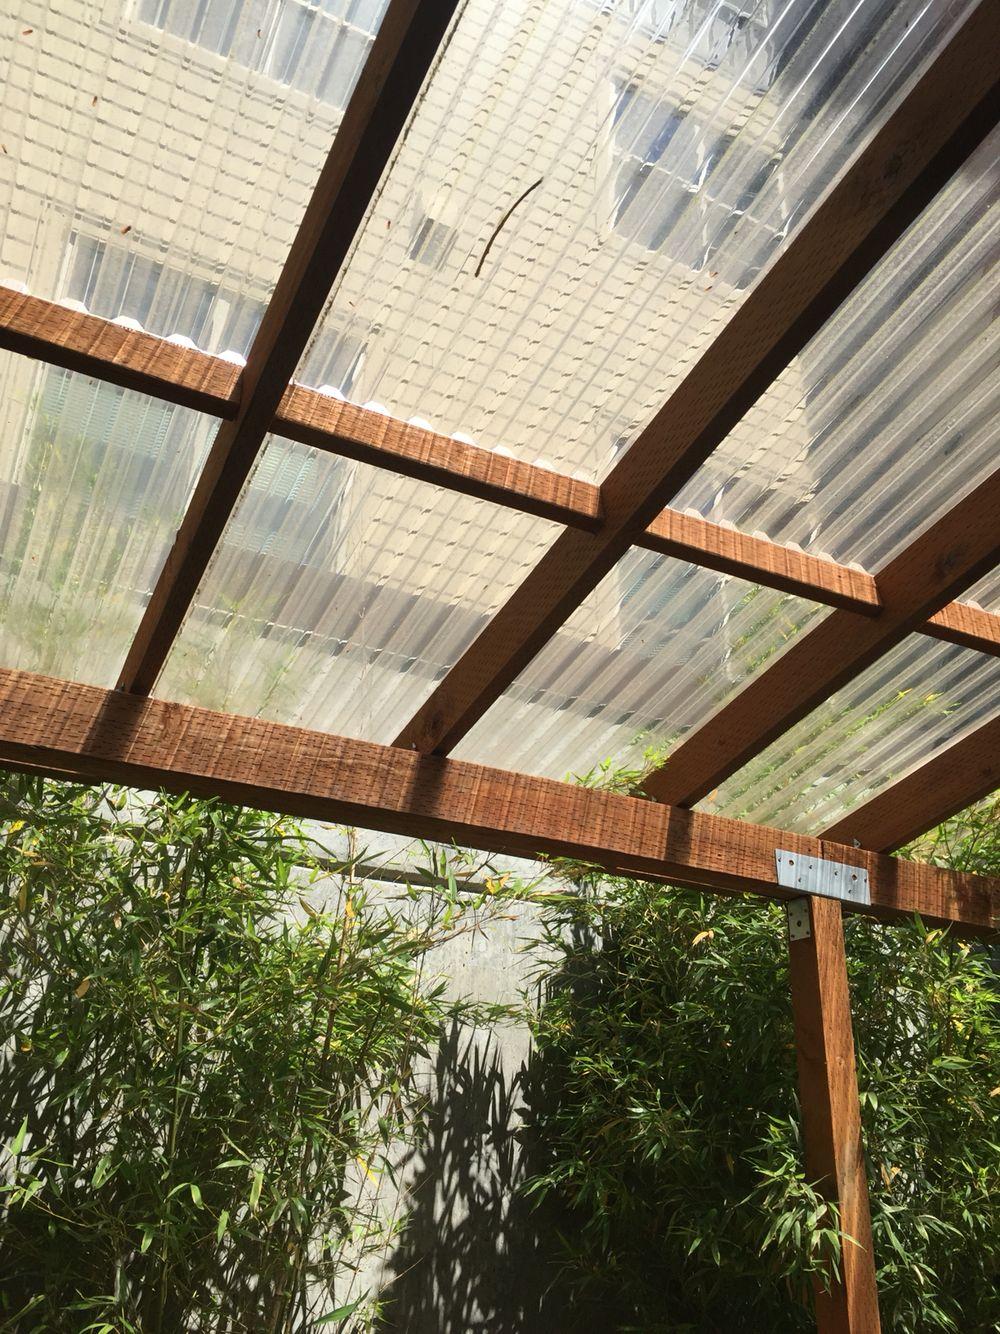 Great Simple Outdoor Roof Mostly Pt 2x4s And Support Beams Telhado Transparente Telhados Ideias De Decoracao Rustica